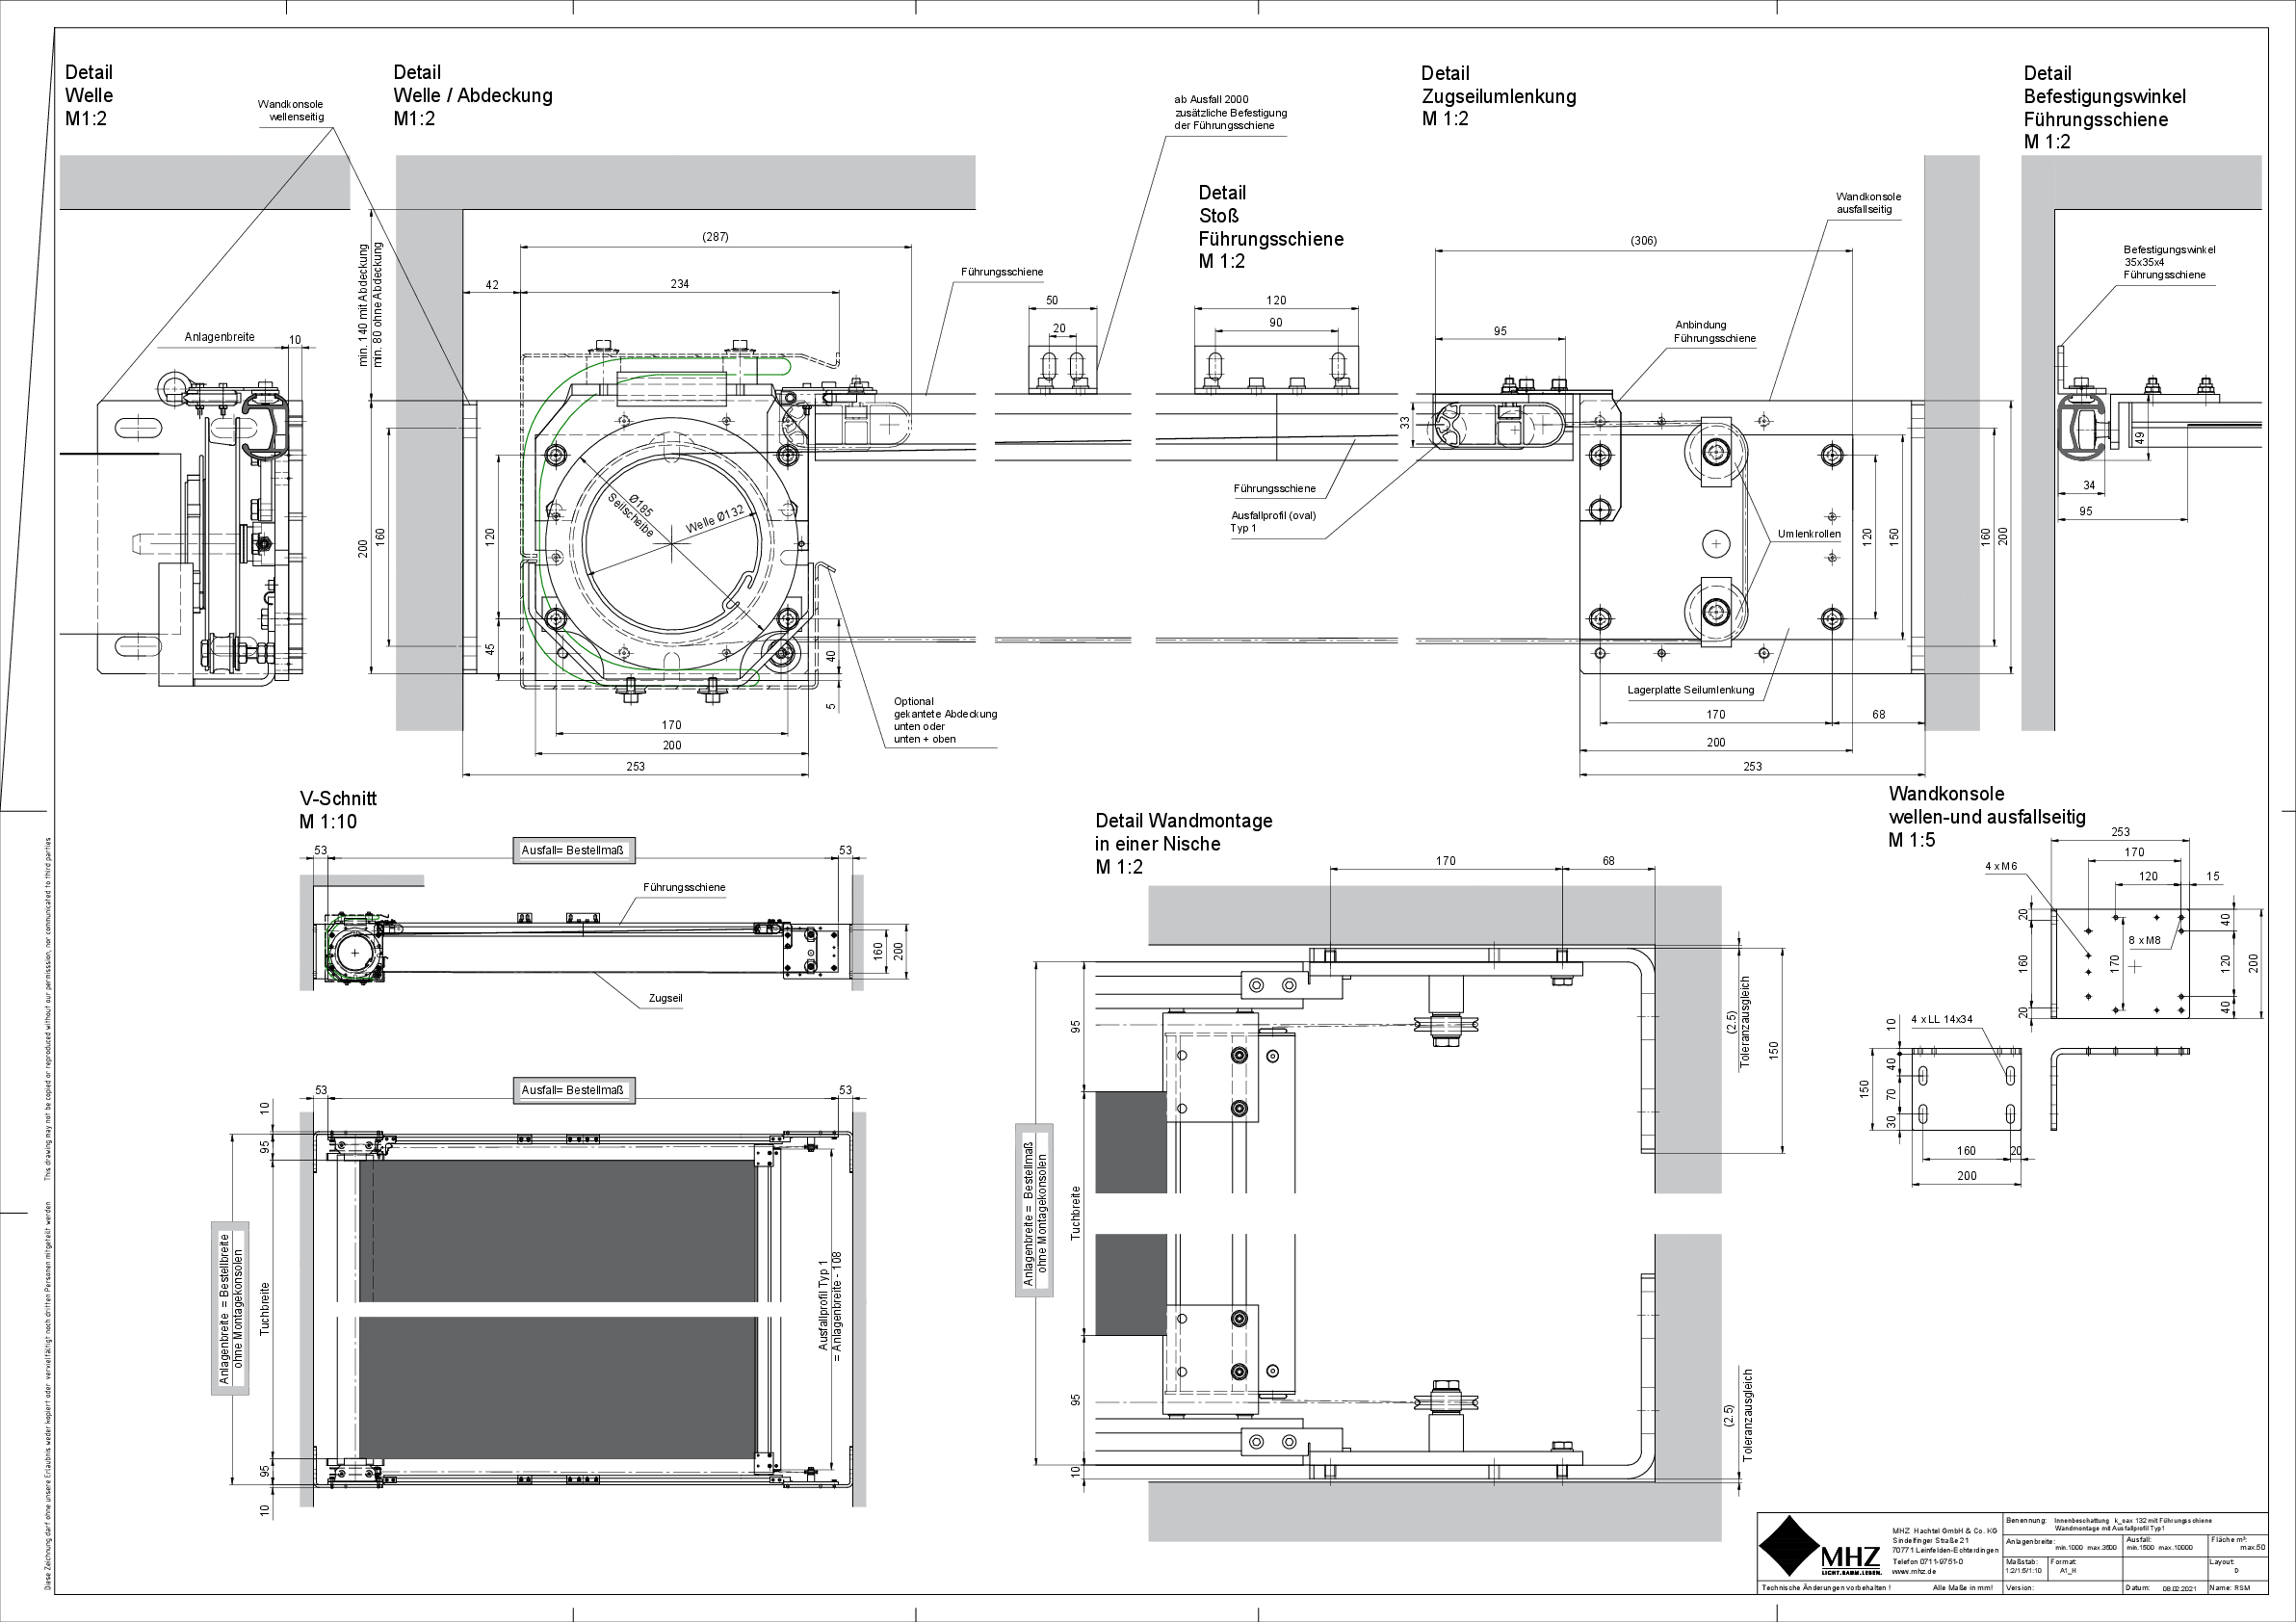 Technische Zeichnung Beschattung k_oax 132 (pdf)